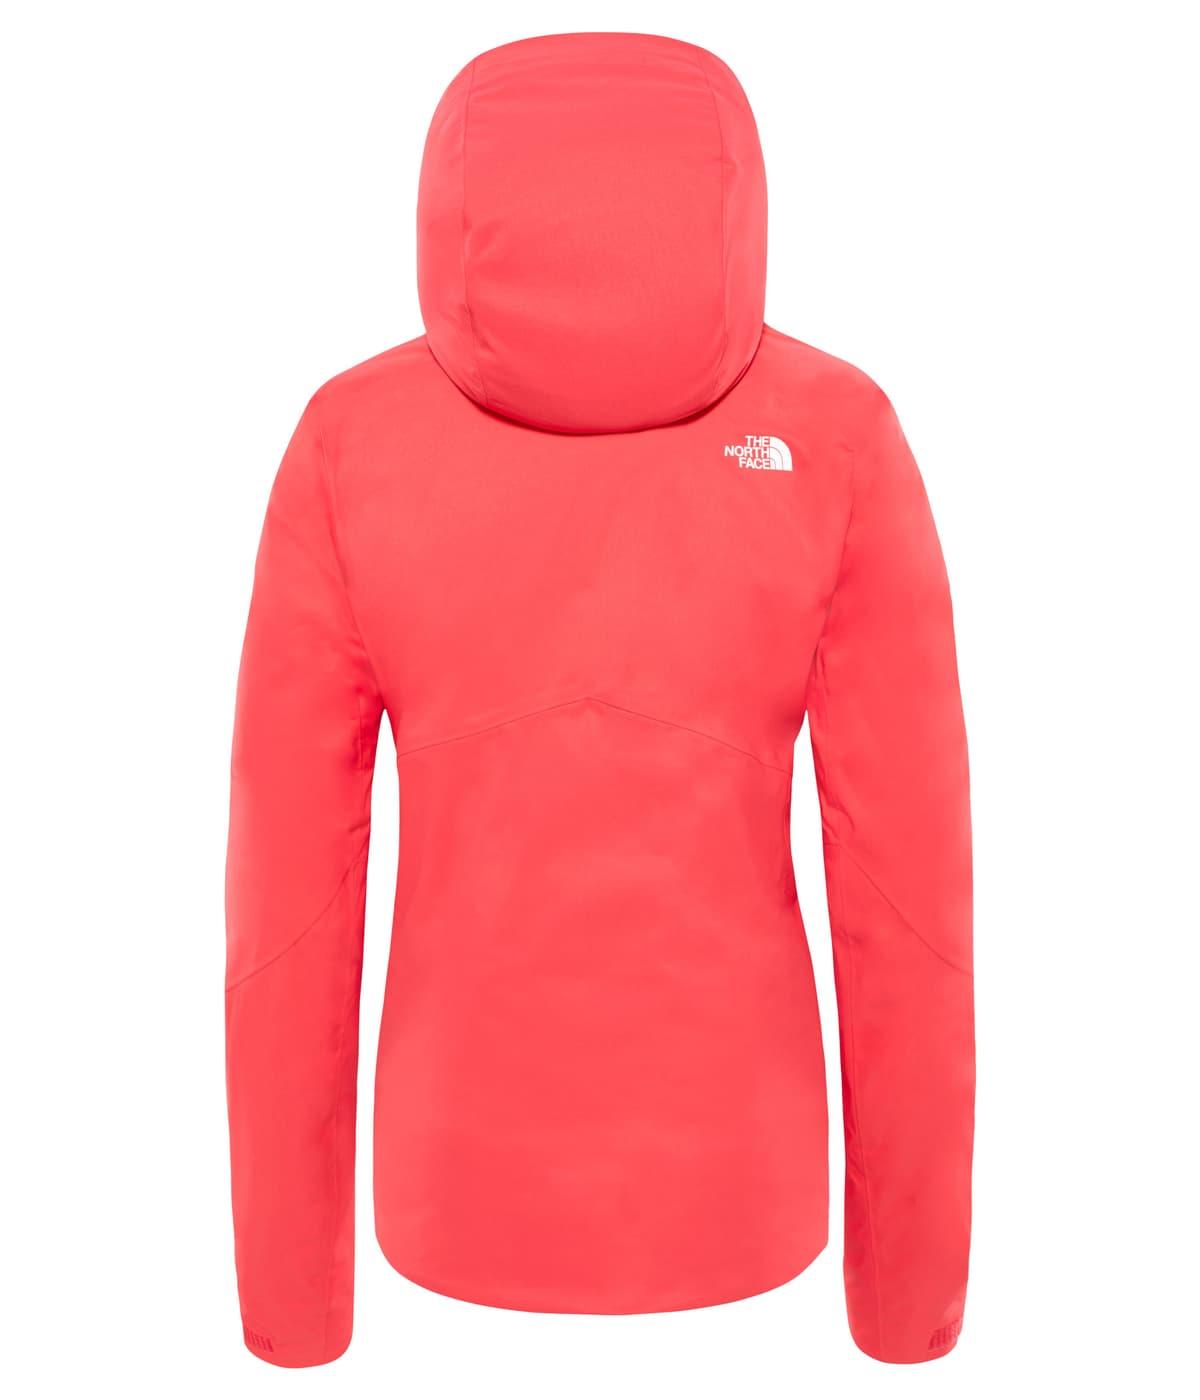 promo code a4425 91fc3 The North Face Sickline Jacket Giacca da sci da donna